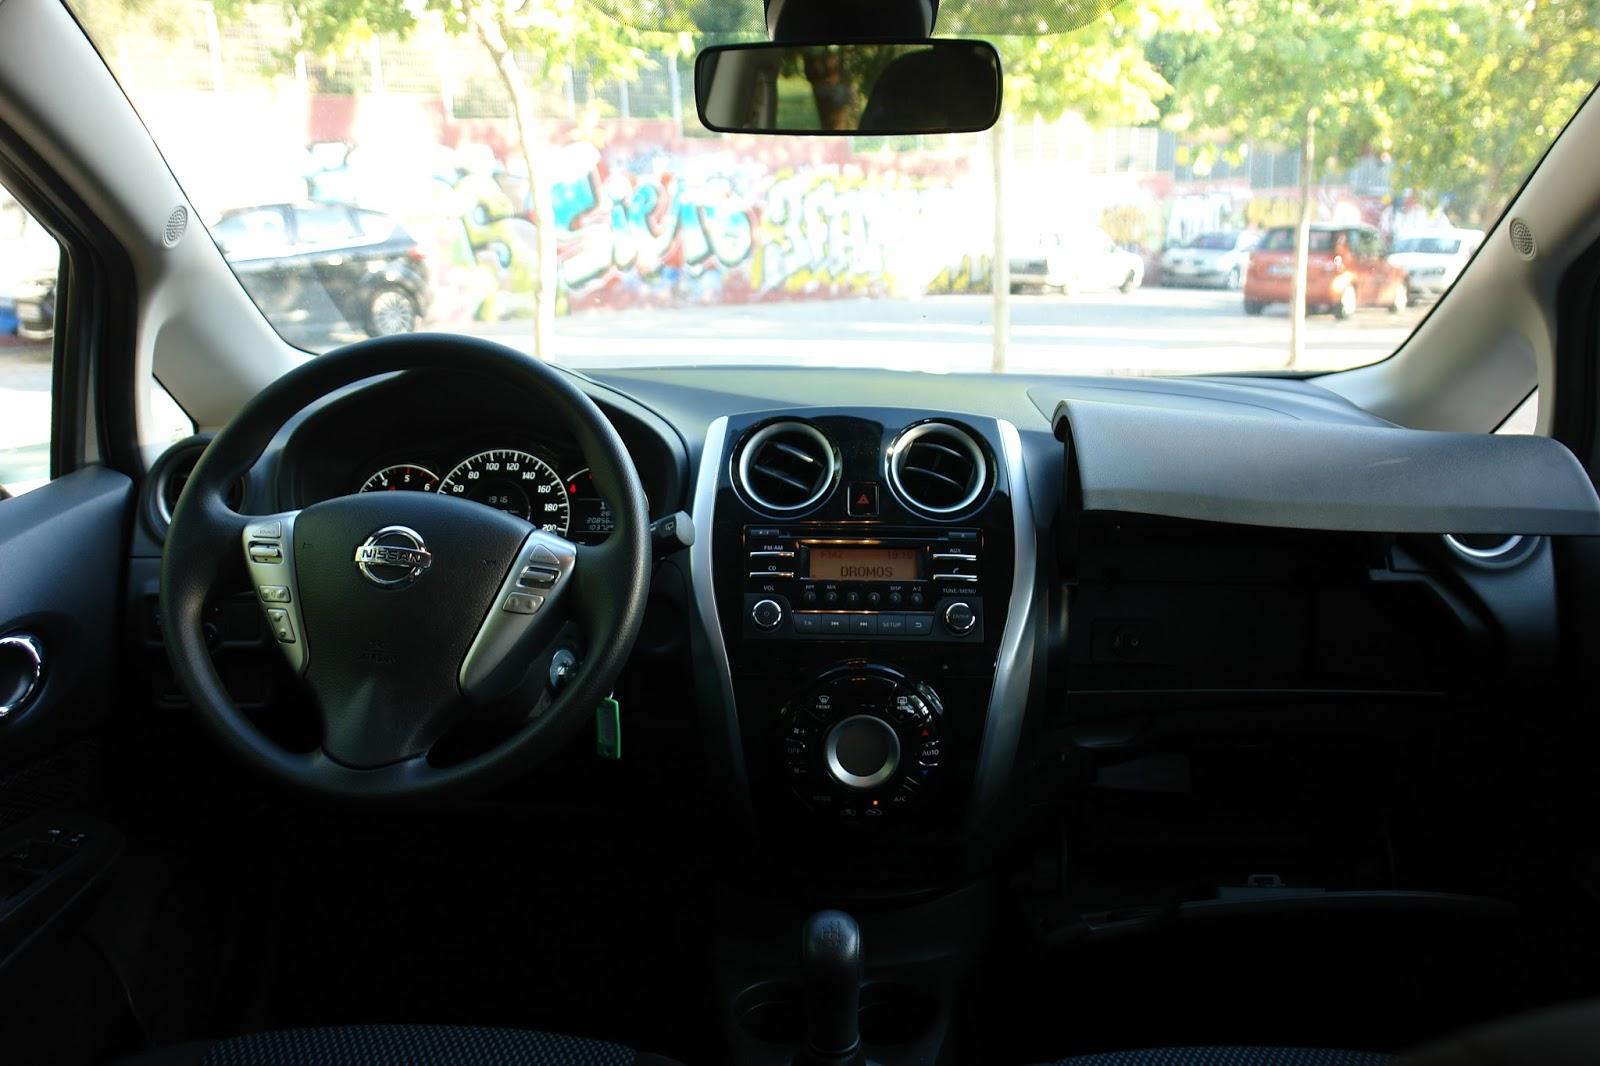 F3 Το Nissan Note έχει μια περίεργη γοητεία Nissan, Nissan Note, TEST, ΔΟΚΙΜΕΣ